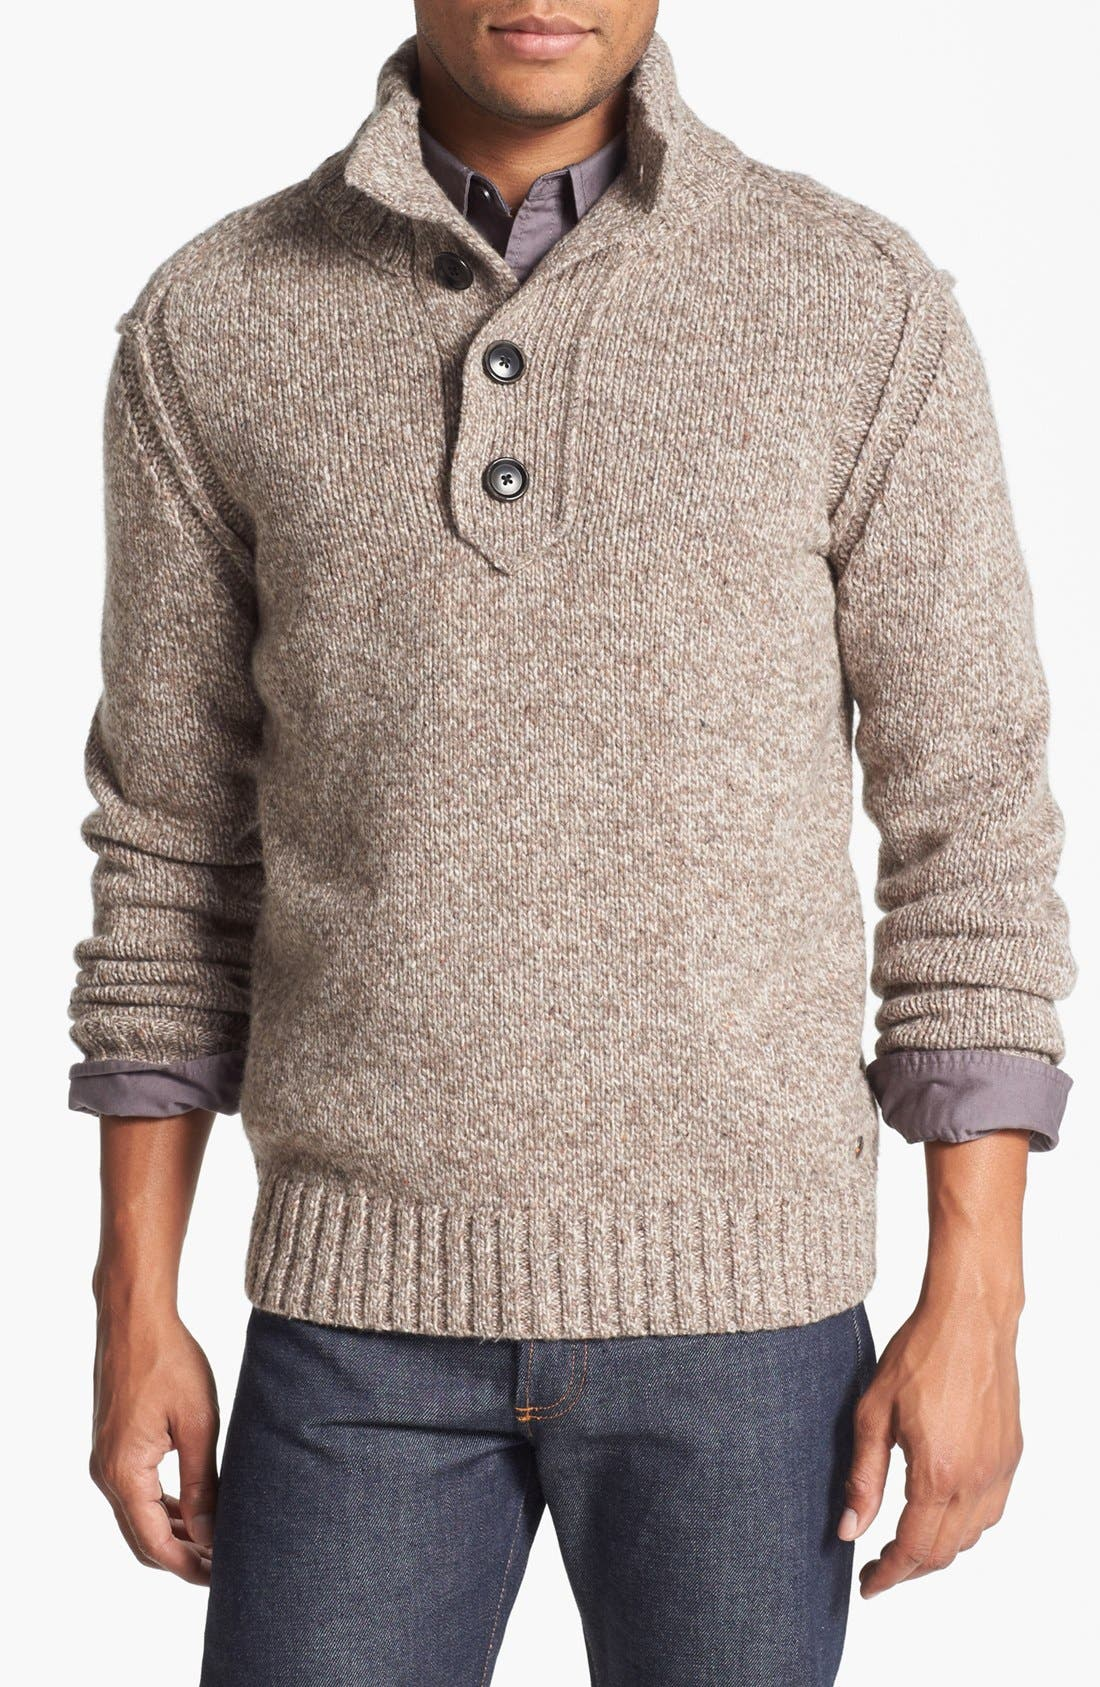 Main Image - BOSS Orange 'Ajeno' Quarter Zip Tweed Yarn Sweater